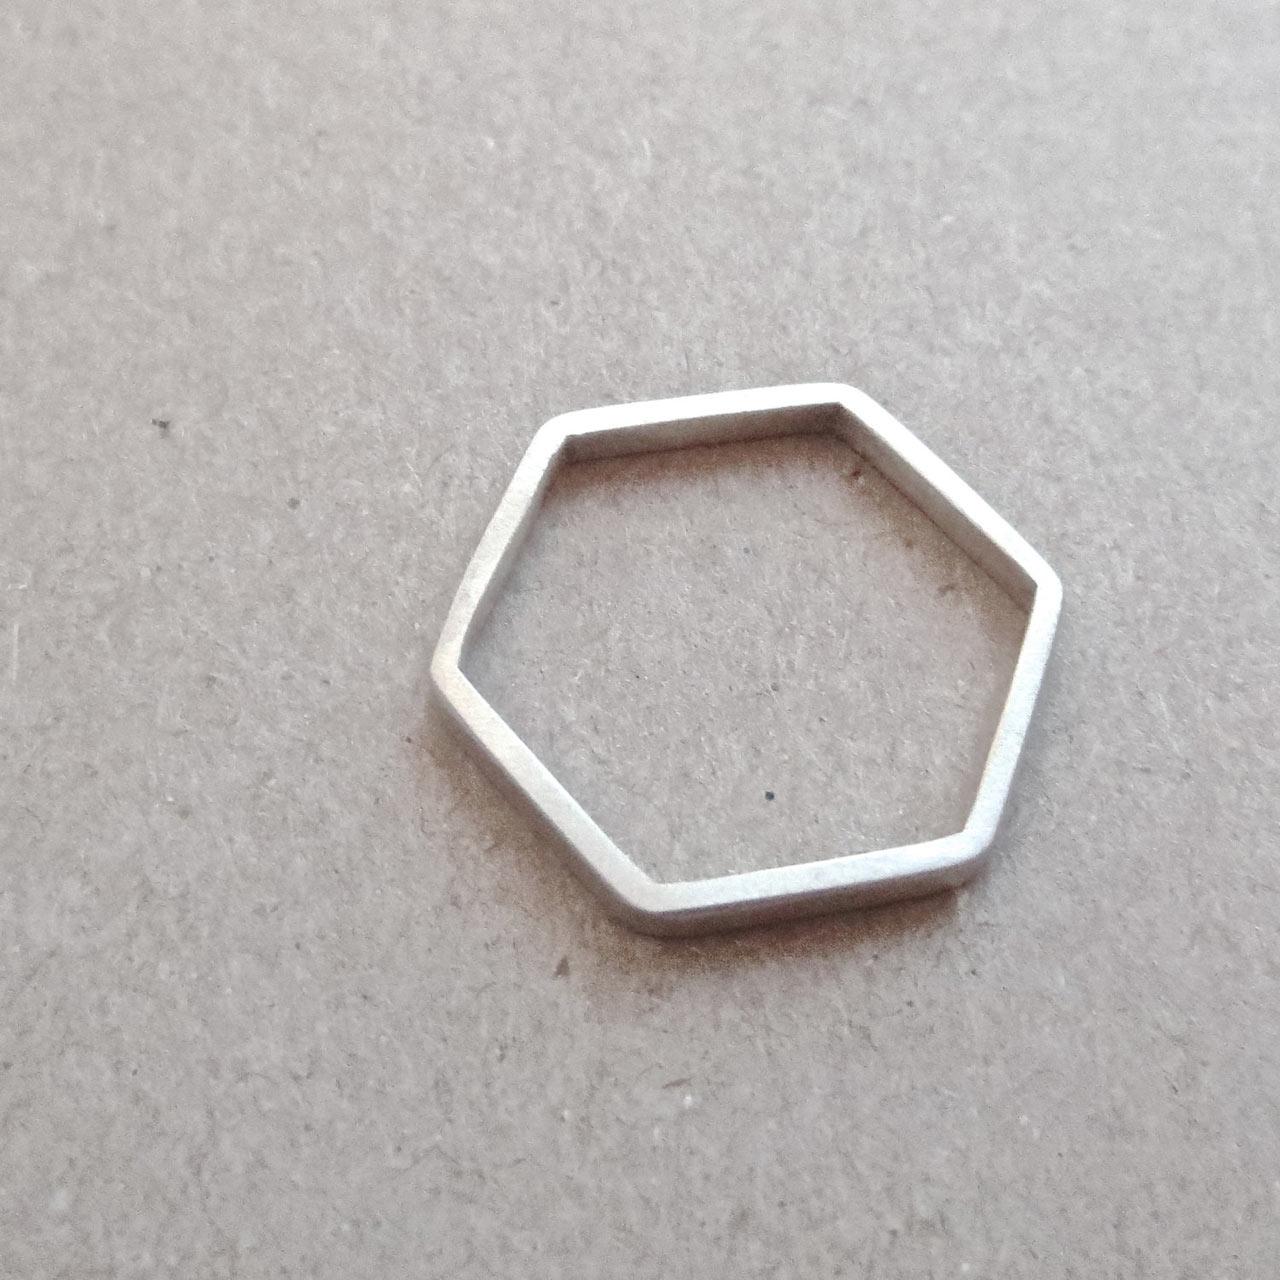 hexagonal-skinny-ring